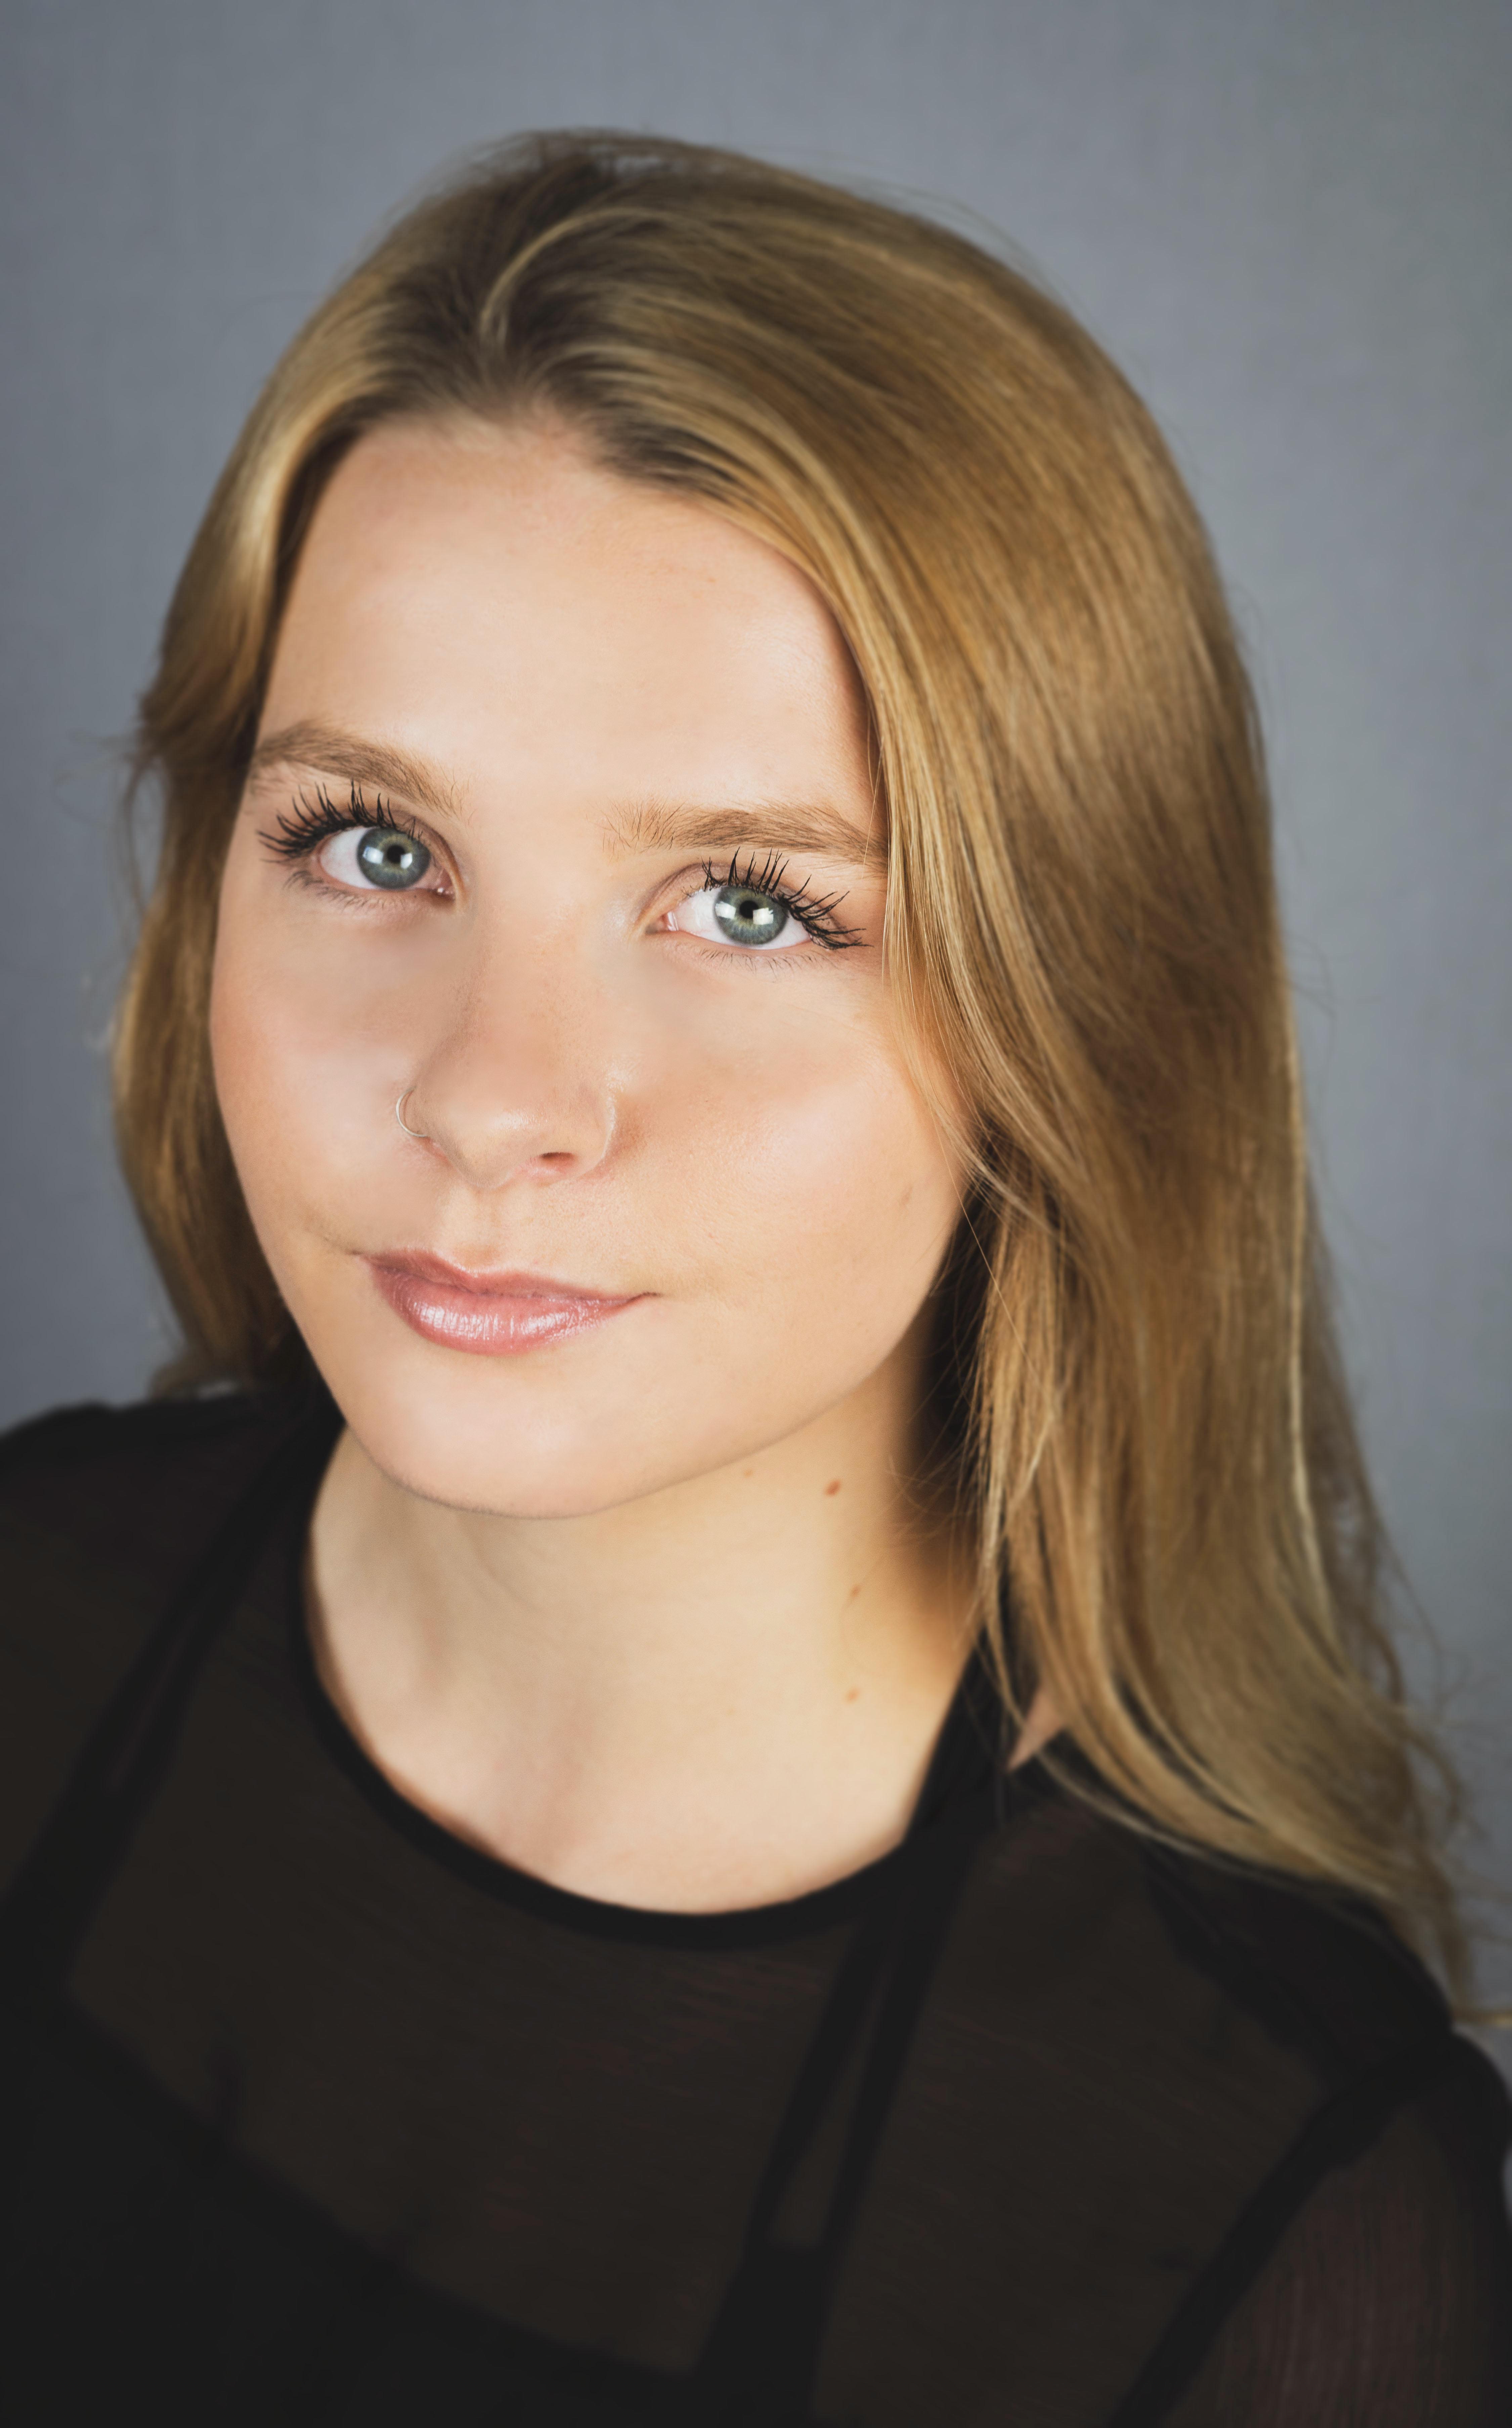 Madeline (Maddie) Adams